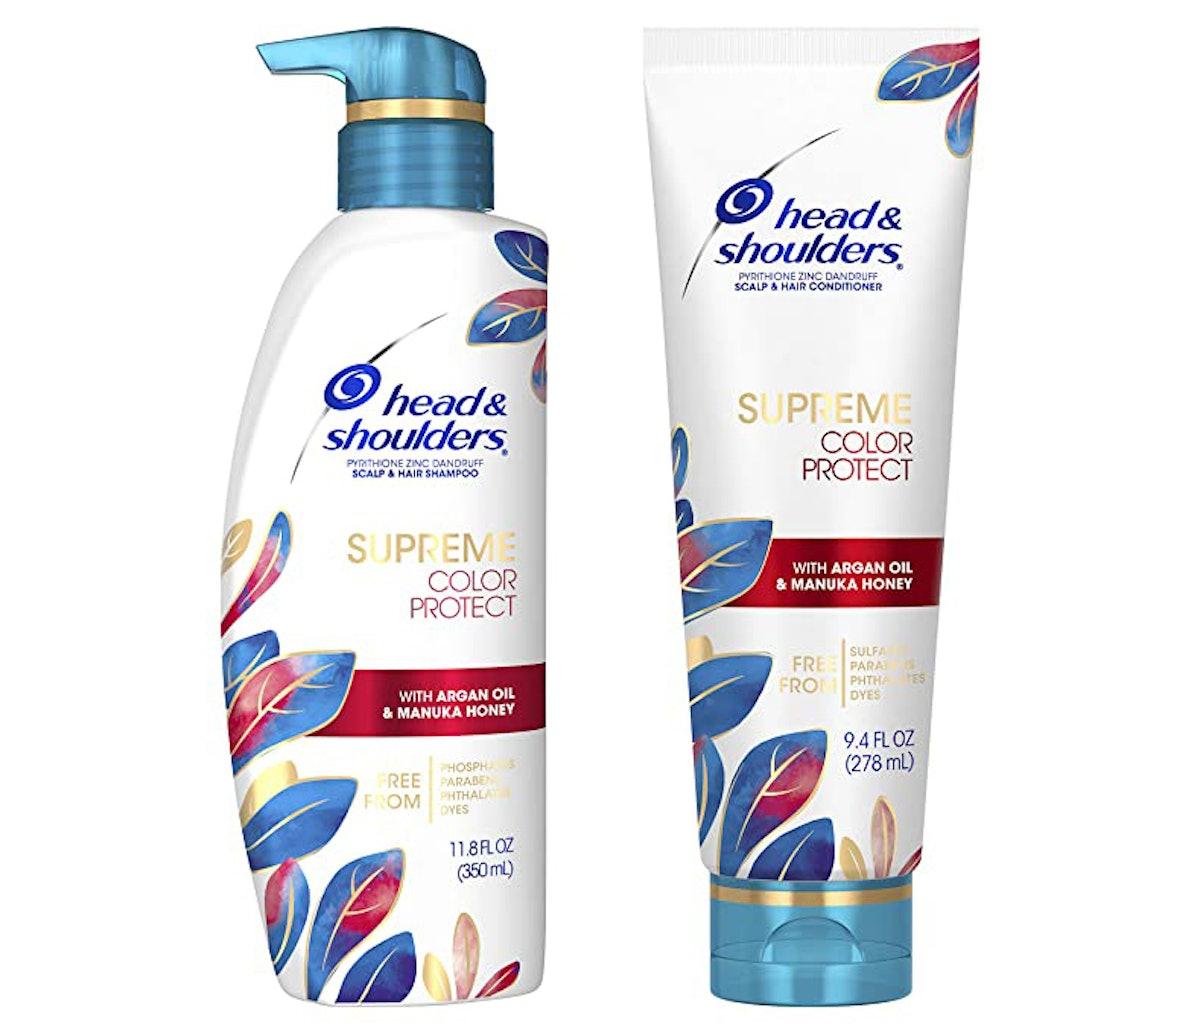 Head & Shoulders Supreme Color Protect Dandruff Shampoo and Conditioner